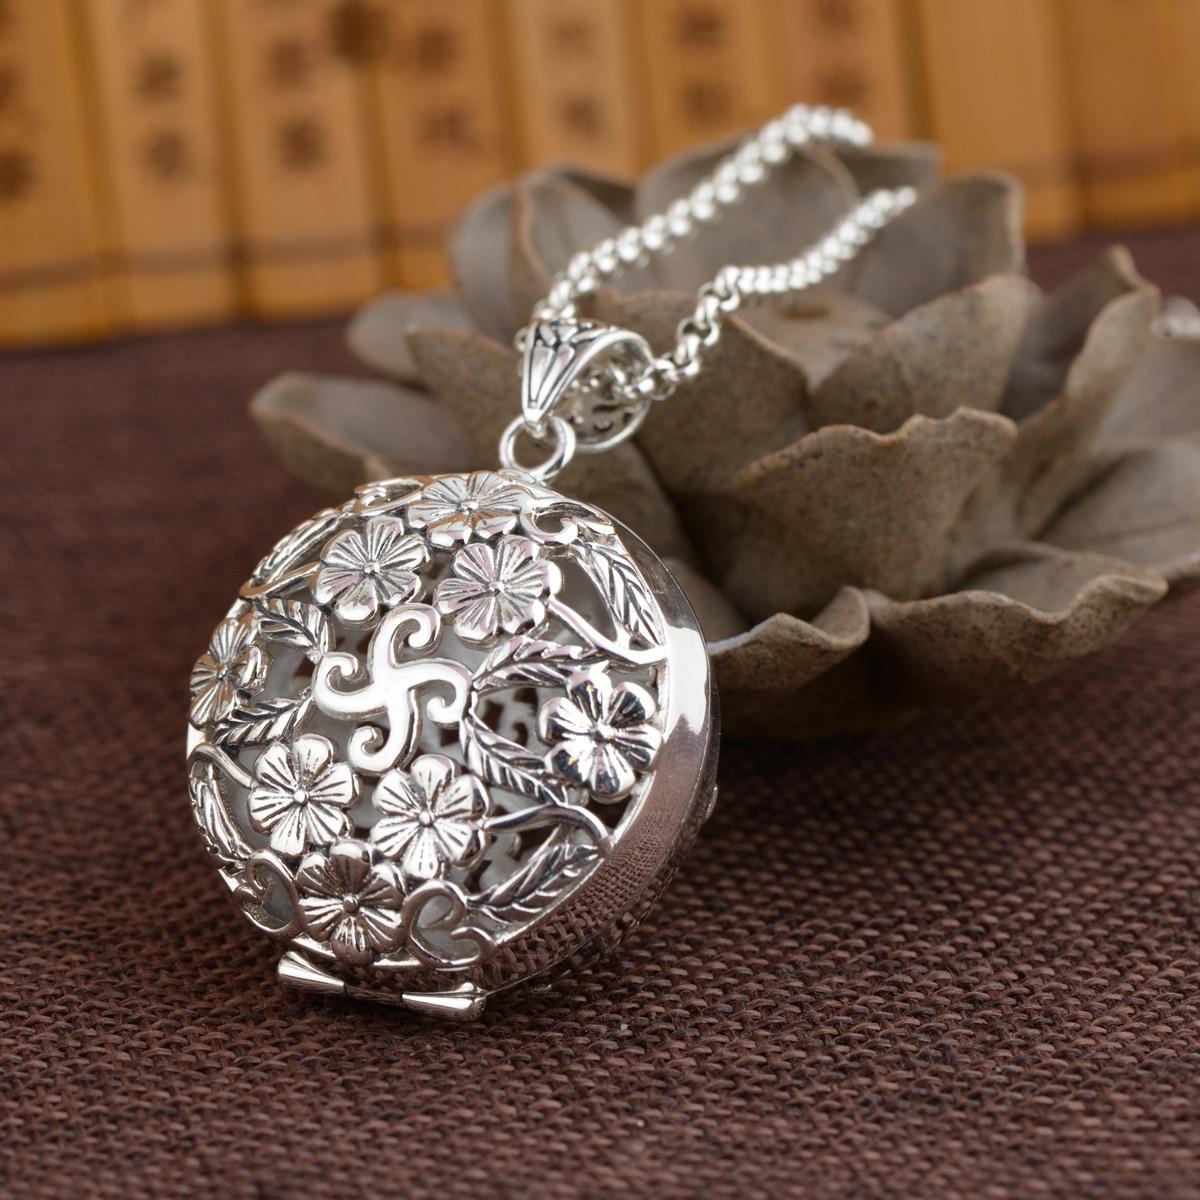 S925 prata thai vintage artesanato pingente budista cultura caixa mantra severo